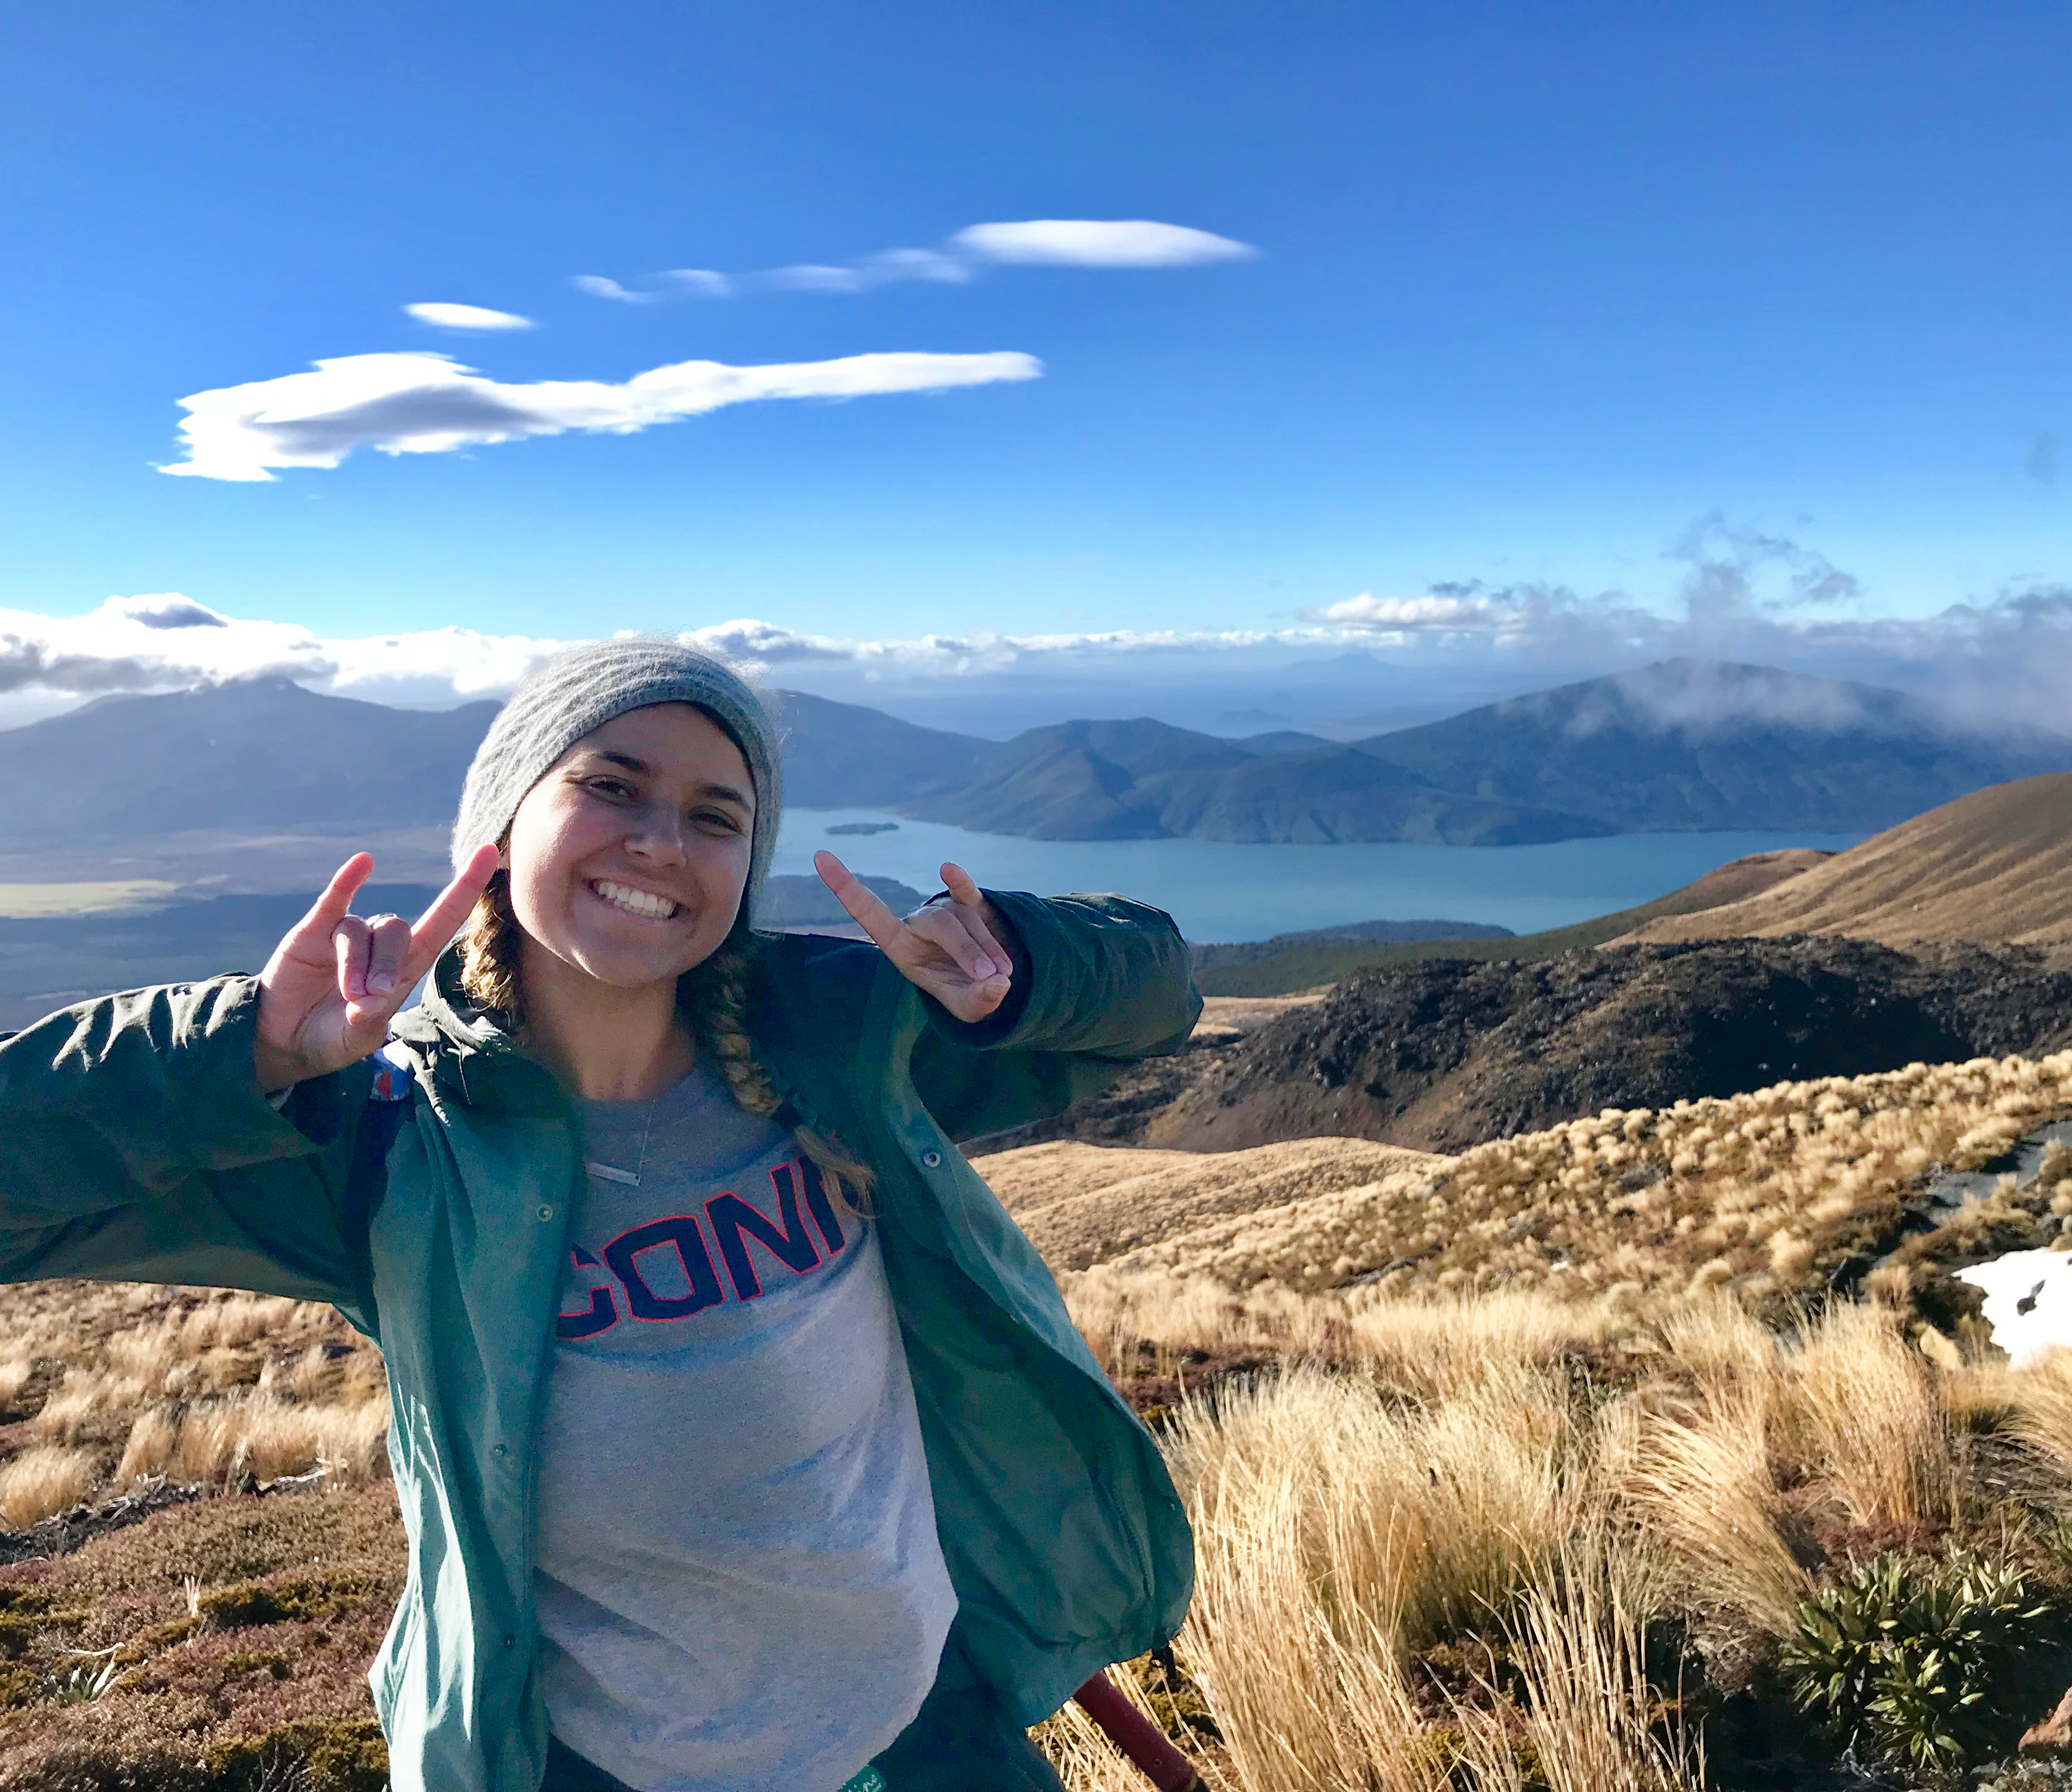 Tongariro-Alpine-Crossing-New-Zealand-Shayne-DePalma